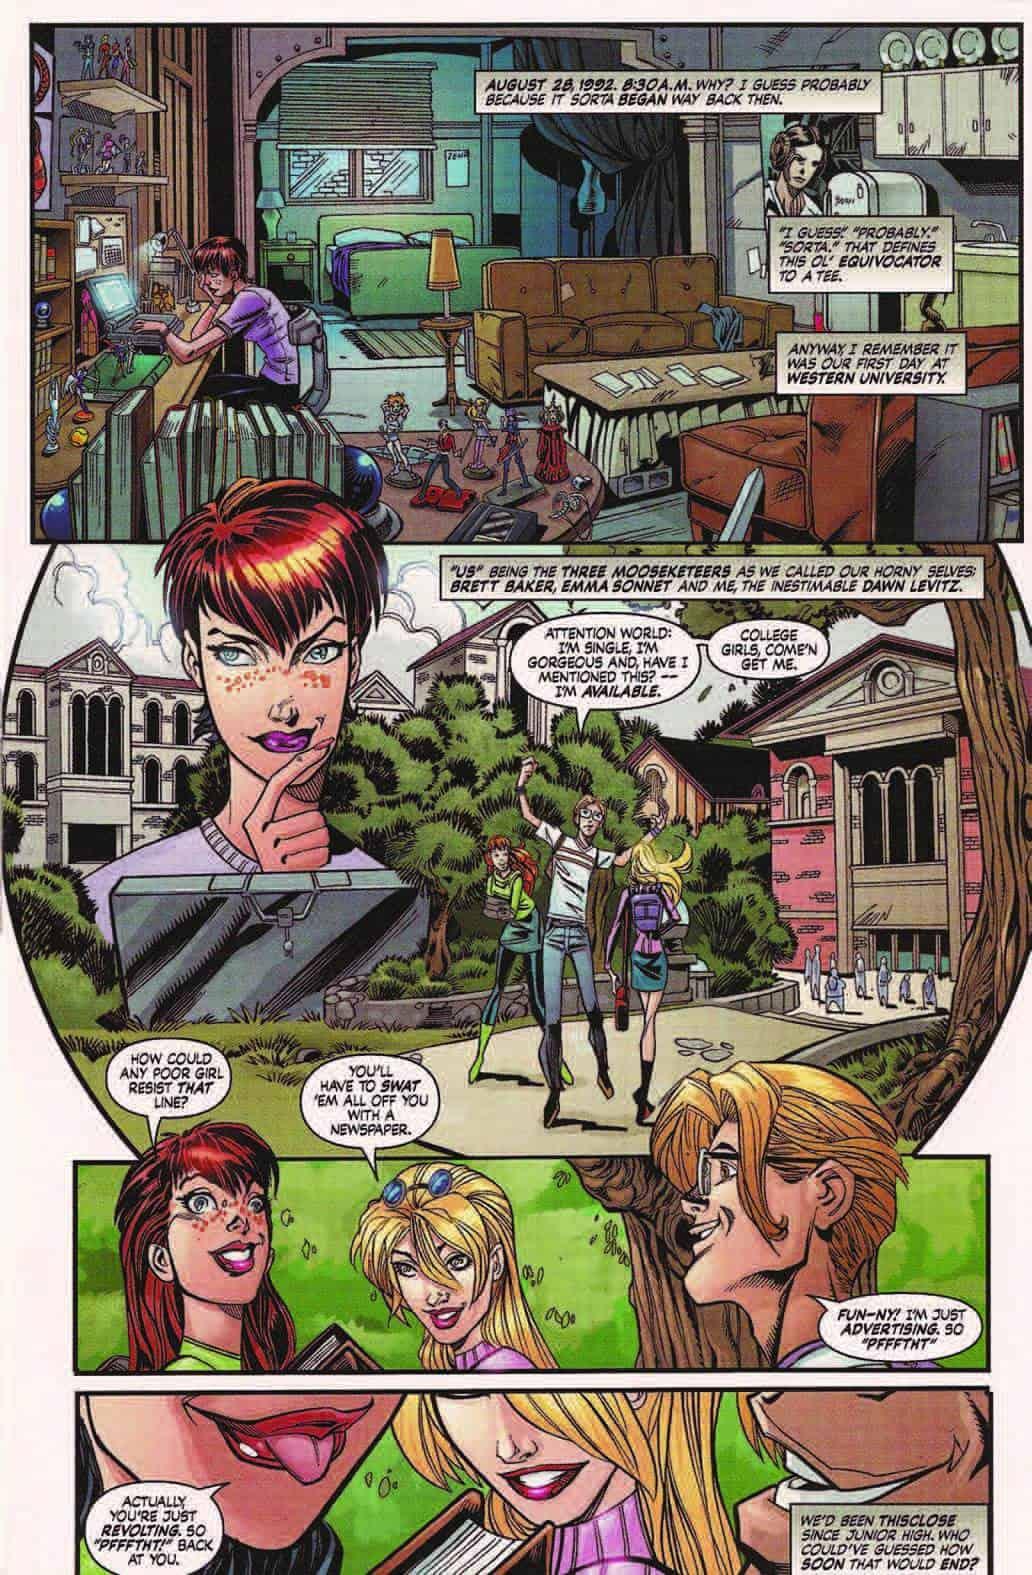 10th-Muse-Vol-1-the-Image-Comics-Run-Part-1-Image-04